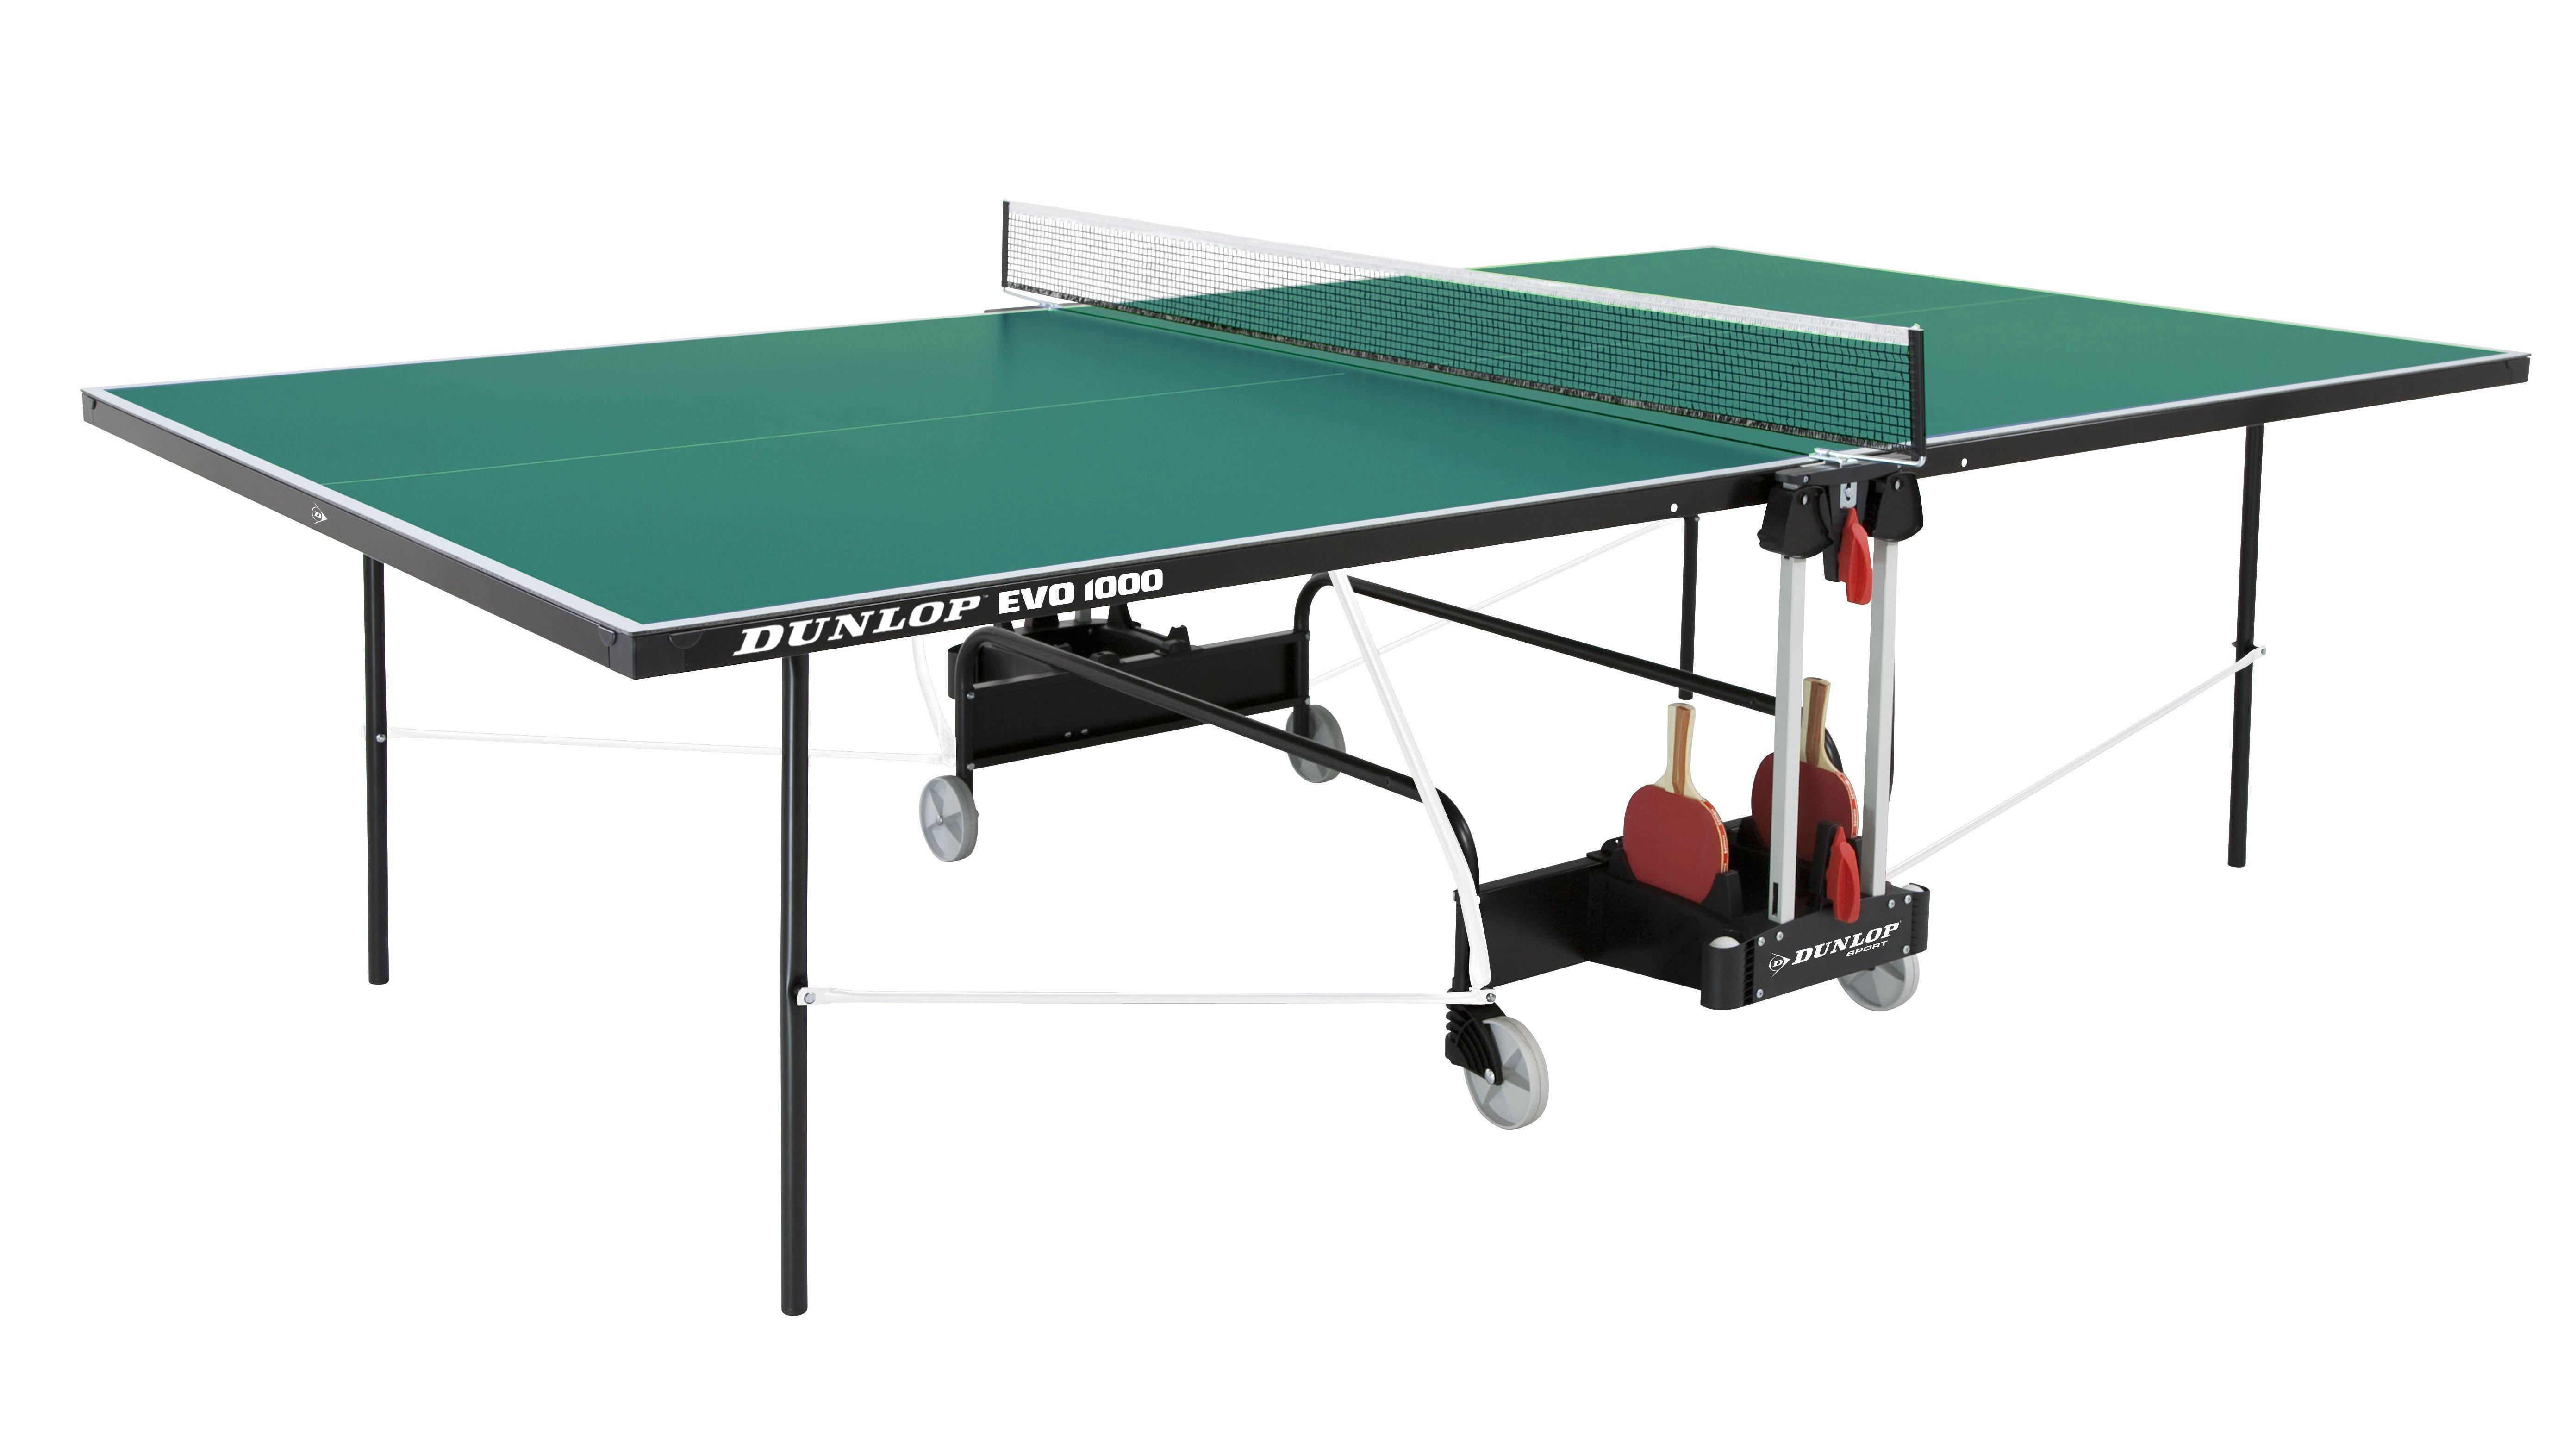 Dunlop Evo 1000 Outdoor Table Tennis Liberty Games